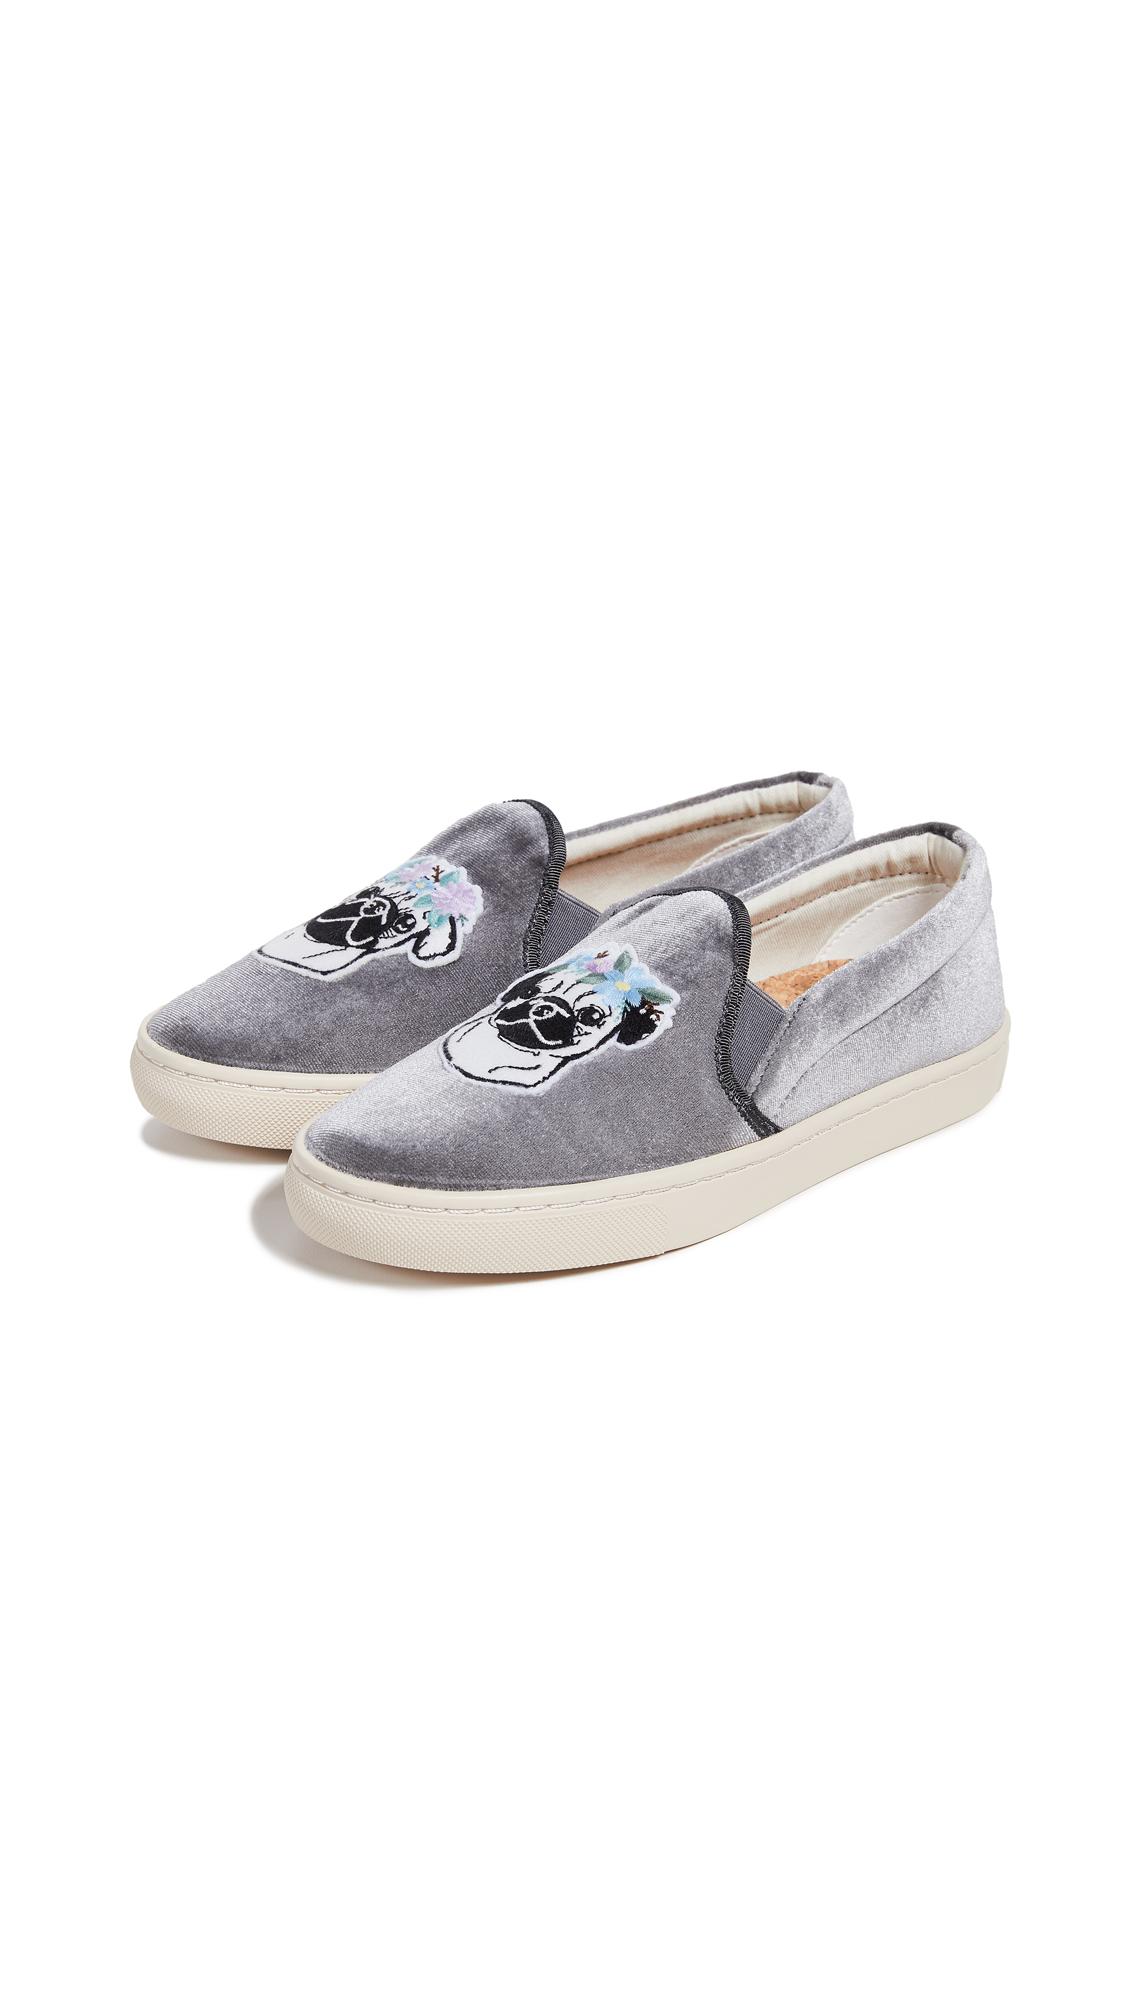 Soludos Flower Pug Slip On Sneakers